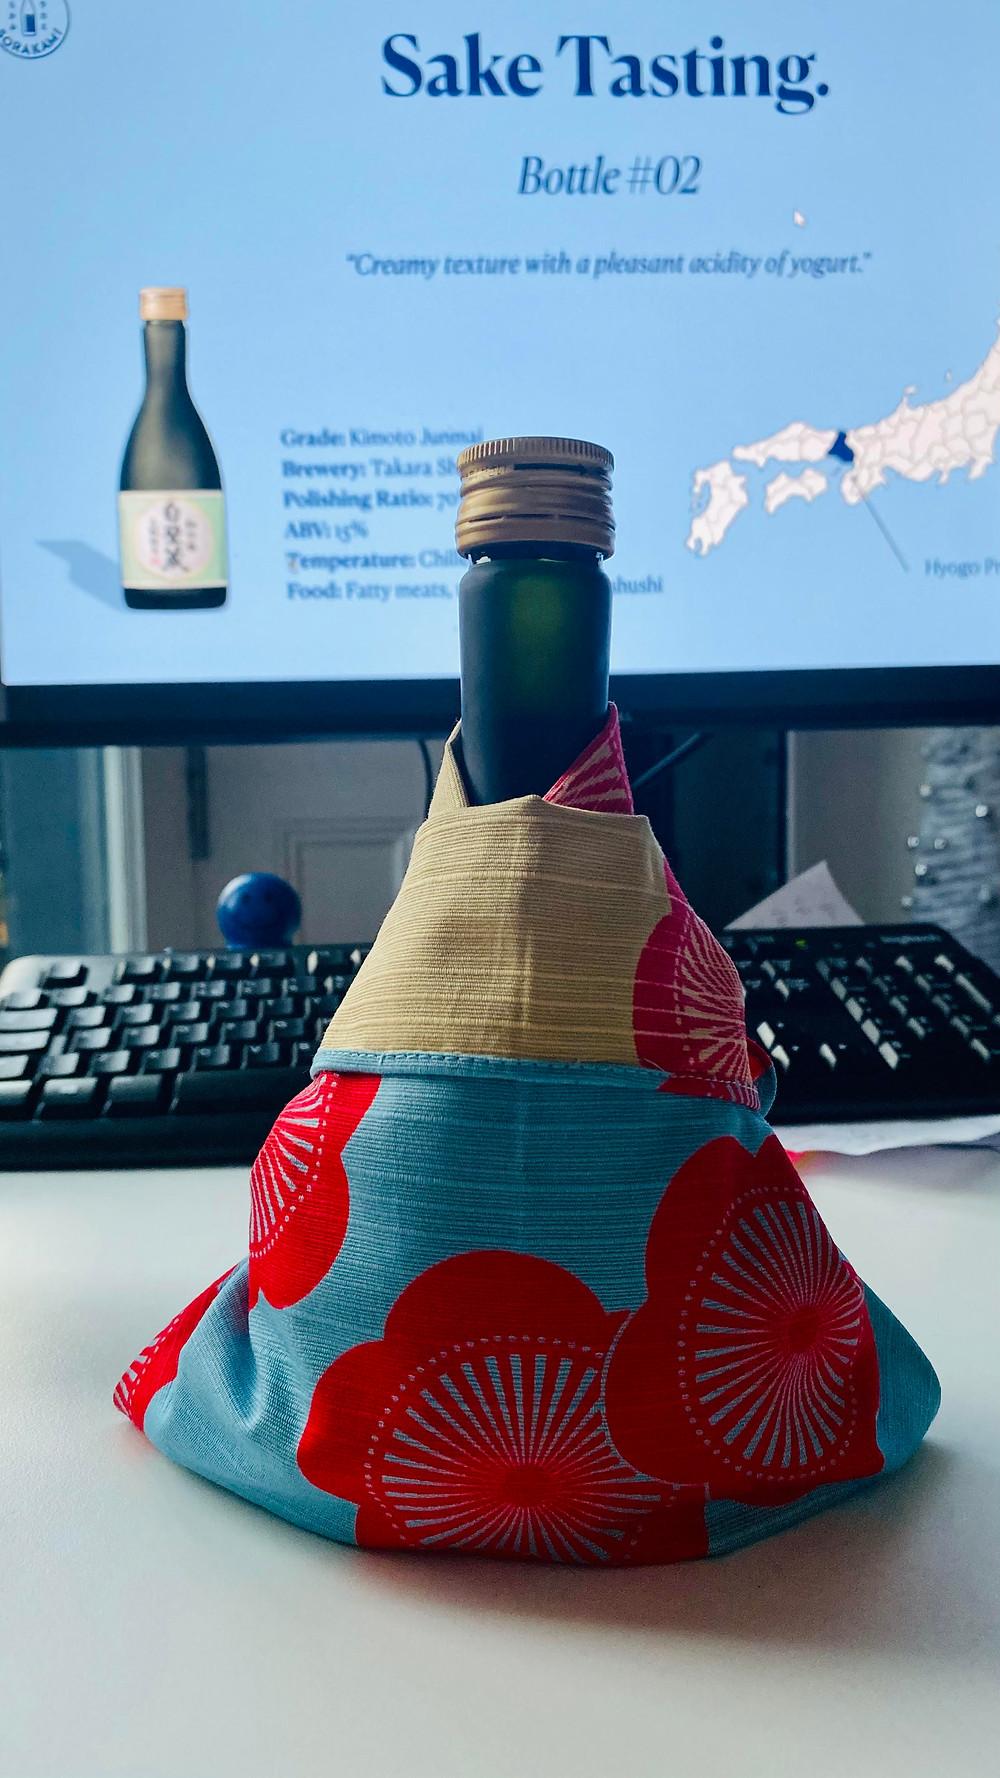 Zusetsu online event furoshiki wrapping workshop and sake